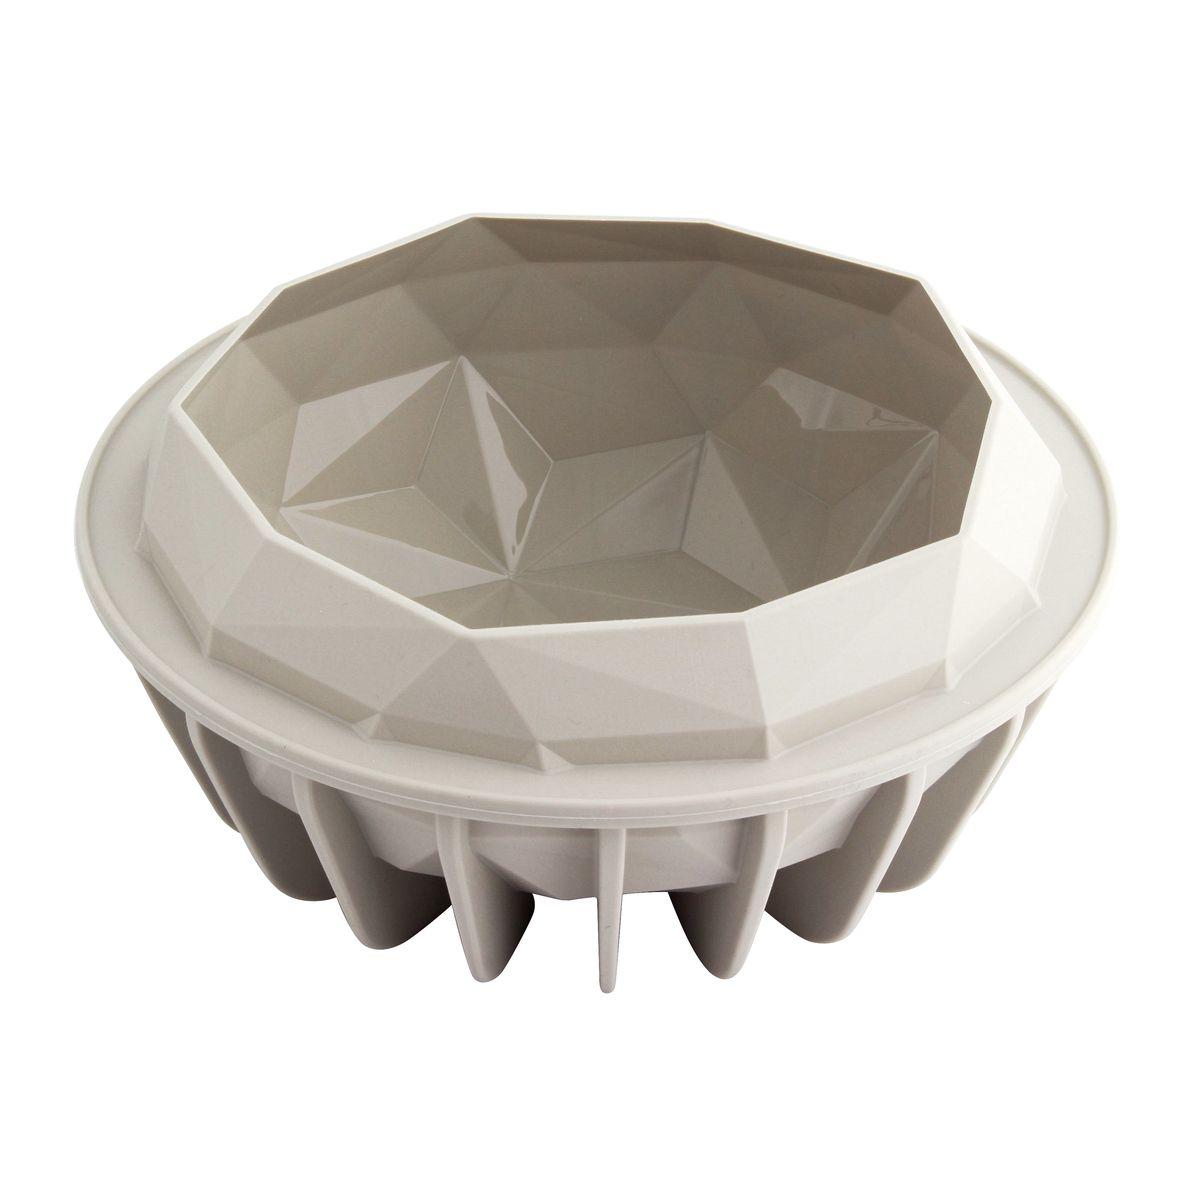 Moule silicone 3D Gemma - Silikomart